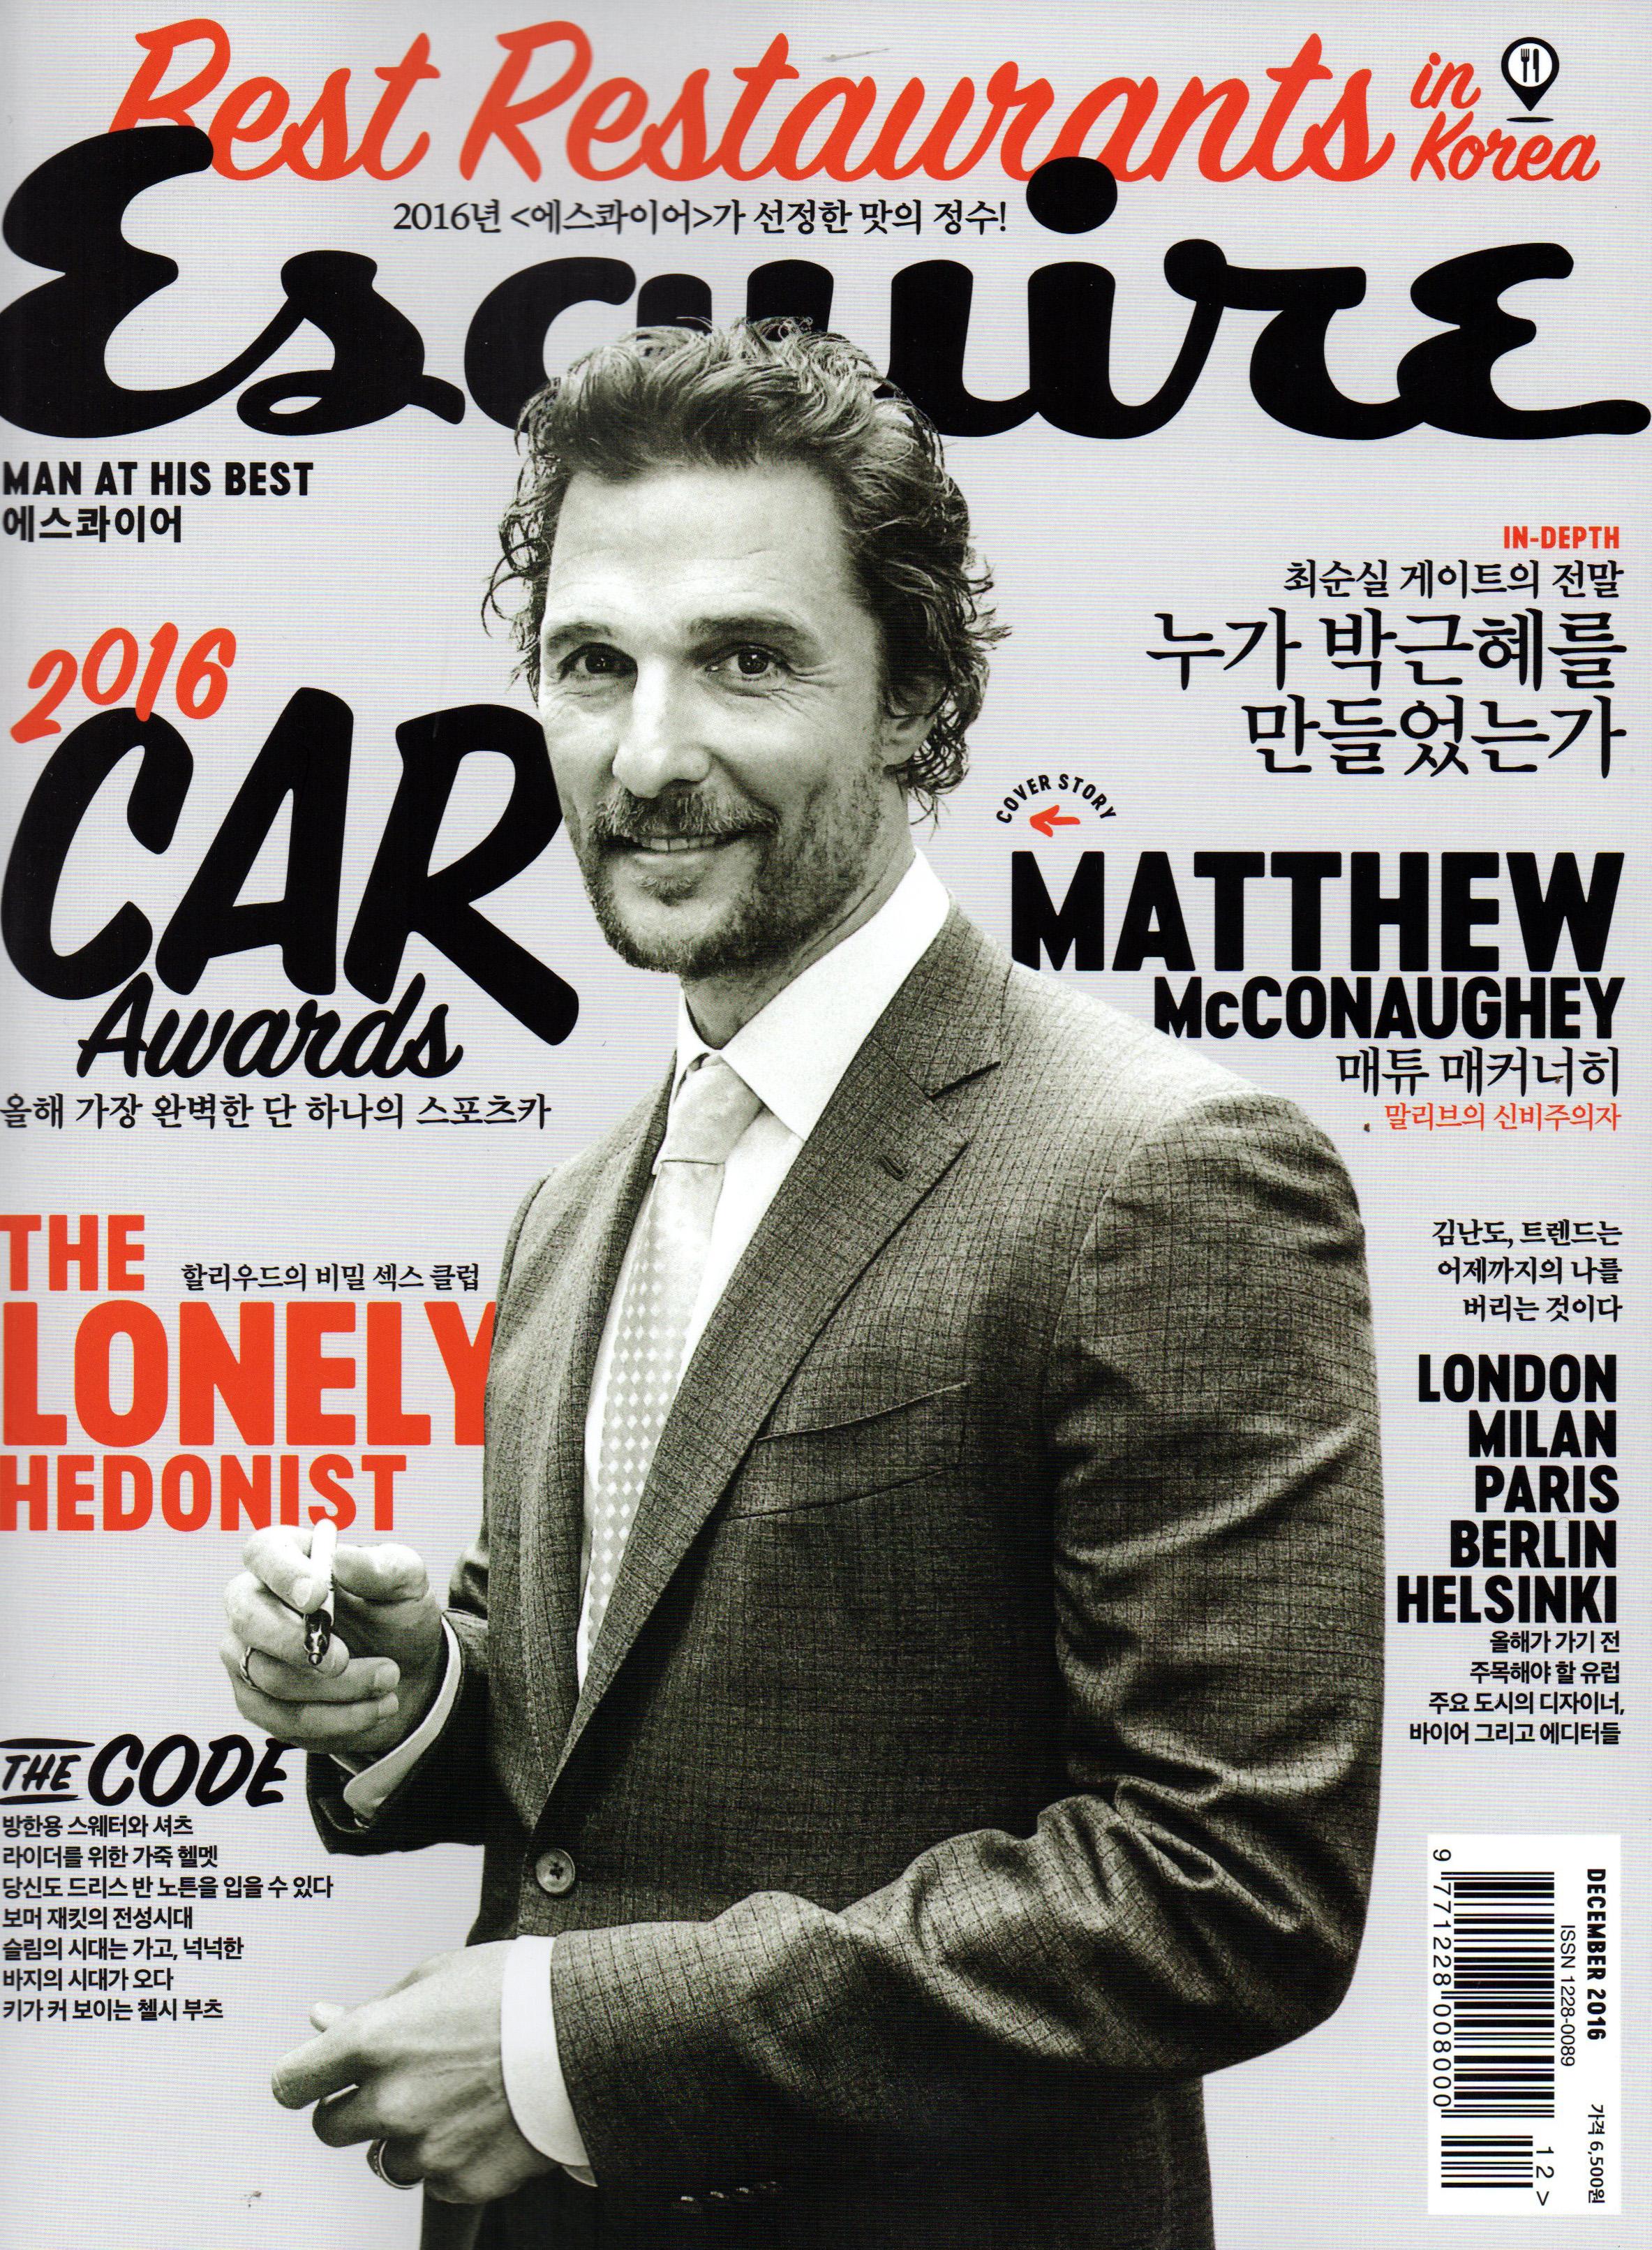 2016-12 Esquire cover.jpg